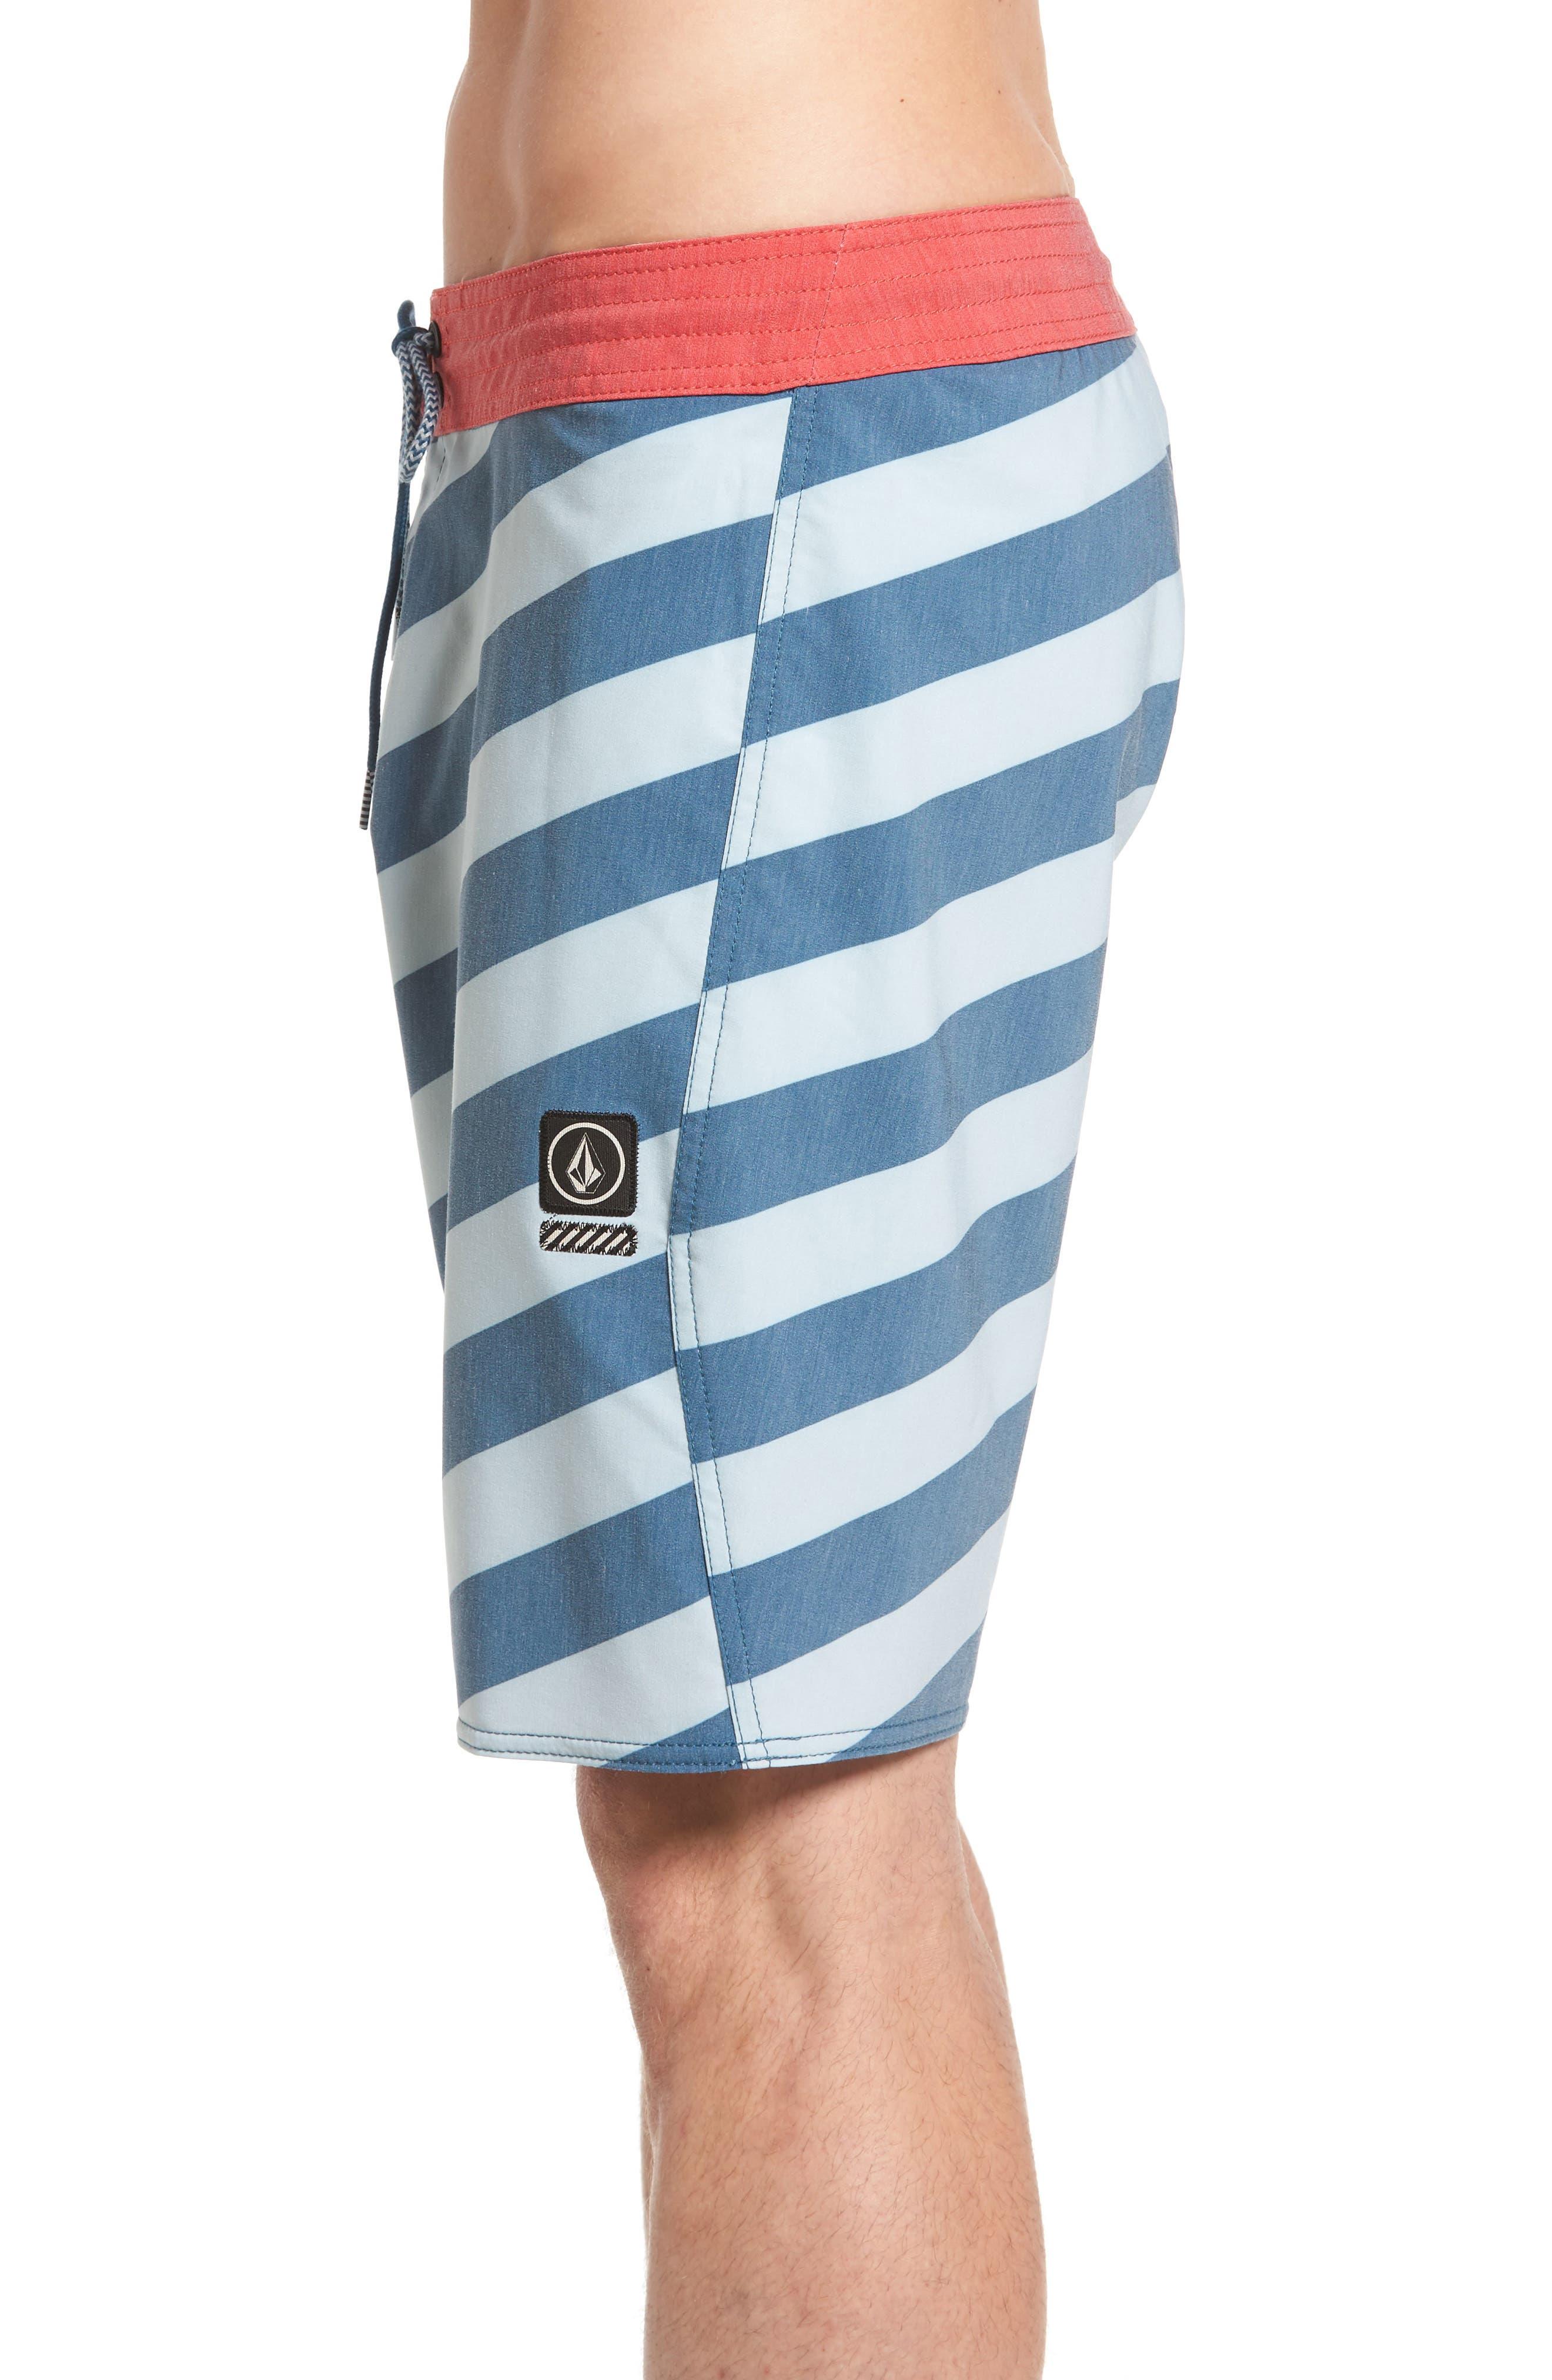 Stripey Slinger Board Shorts,                             Alternate thumbnail 3, color,                             Flight Blue